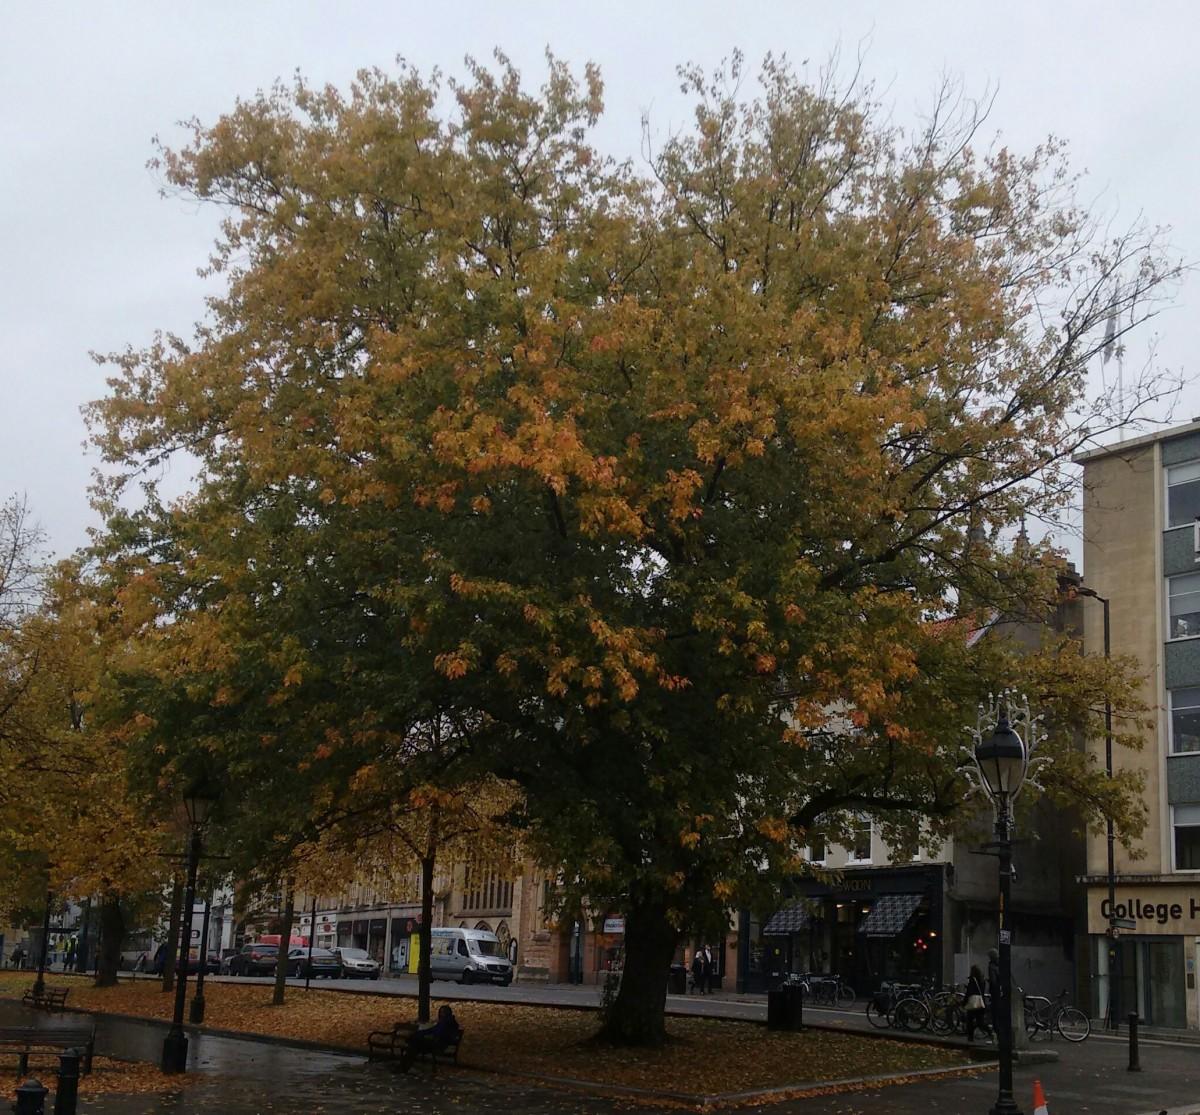 Sponsor or adopt a Bristoltree